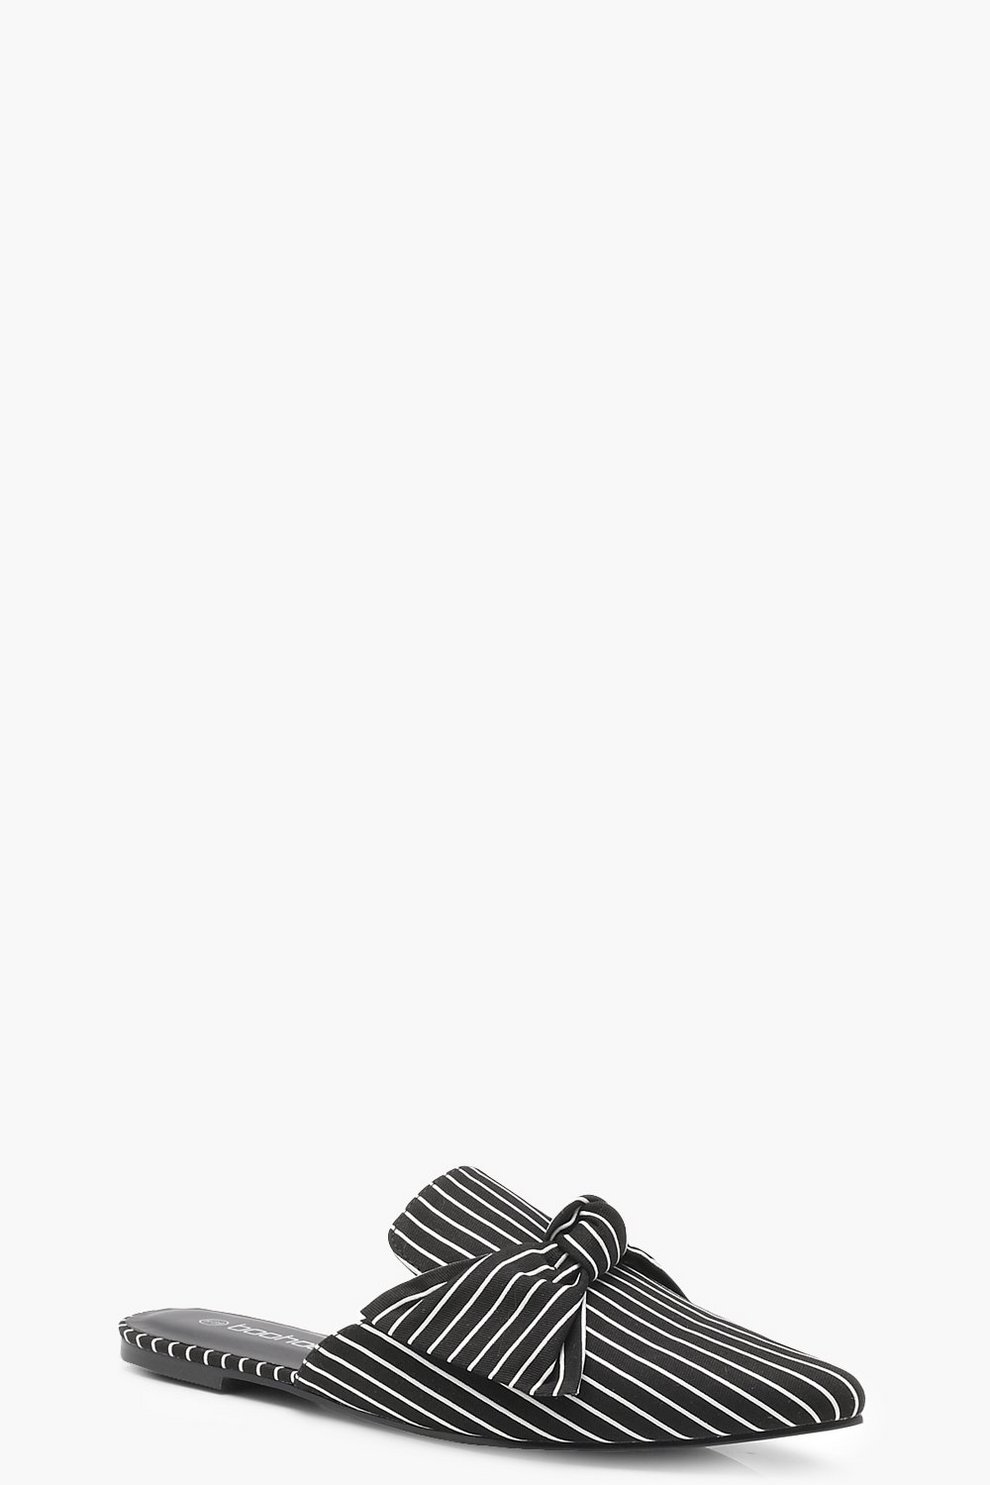 Mule a punta con righine sottili e fiocco davanti Comprar Barato Últimas Colecciones PiNRey